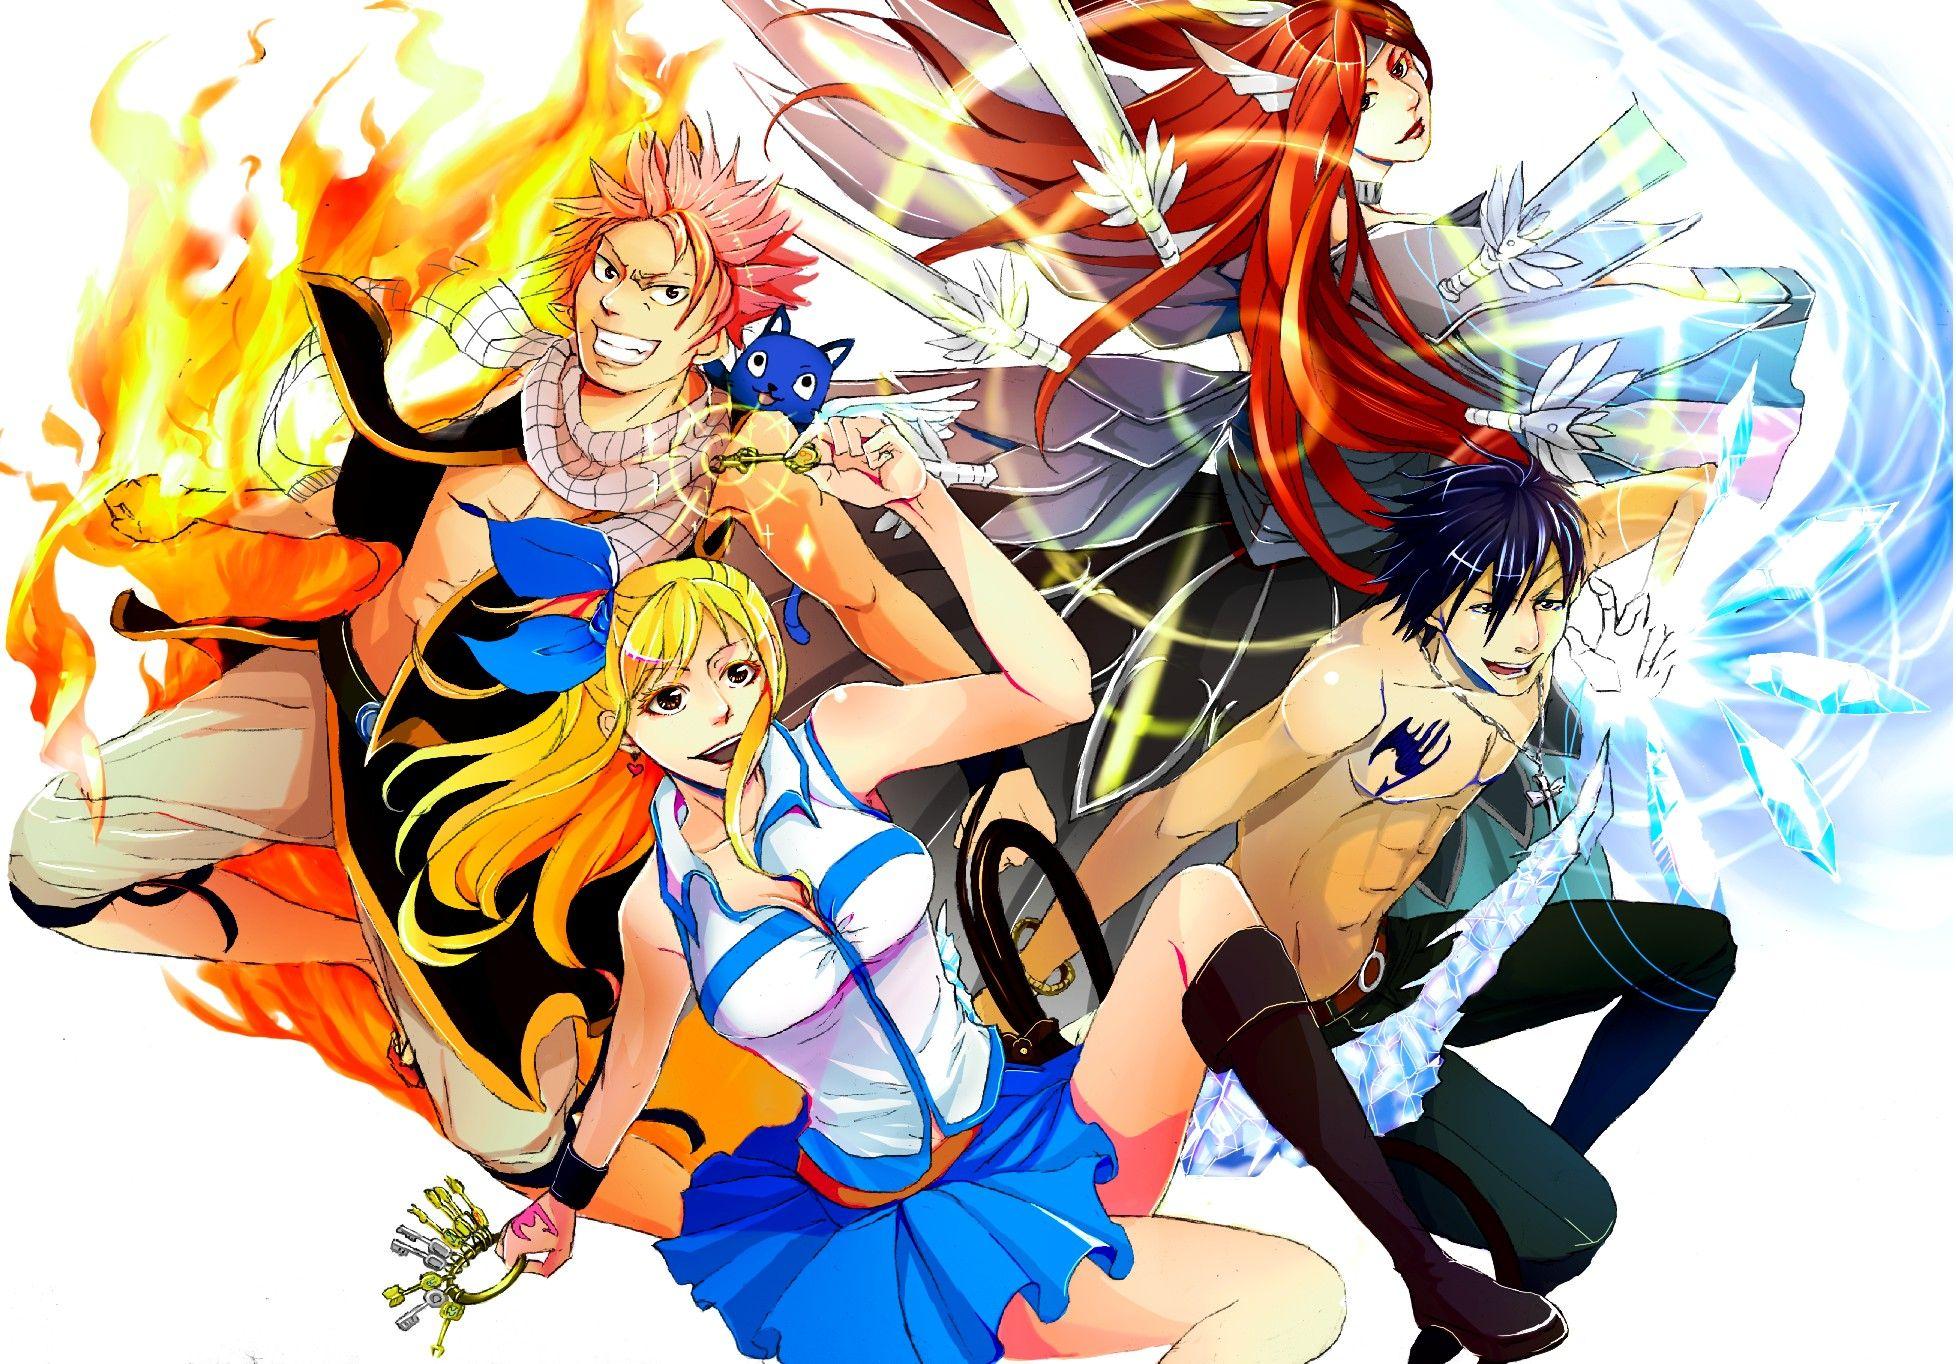 FAIRY.TAIL.full.1079015.jpg (1956×1364) Anime, Anime